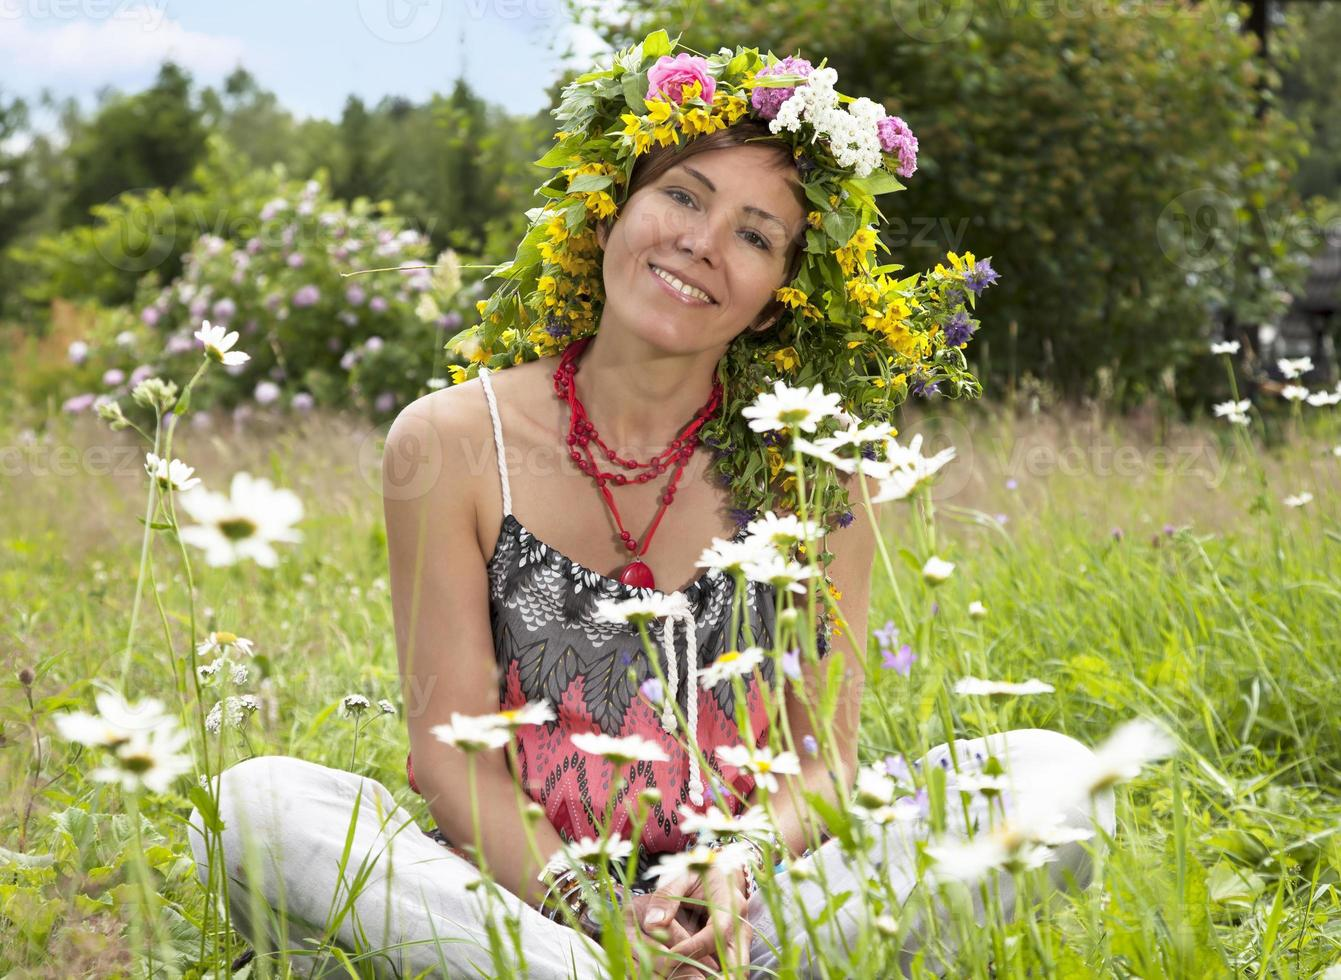 Portrait of hippie girl in a wreath photo